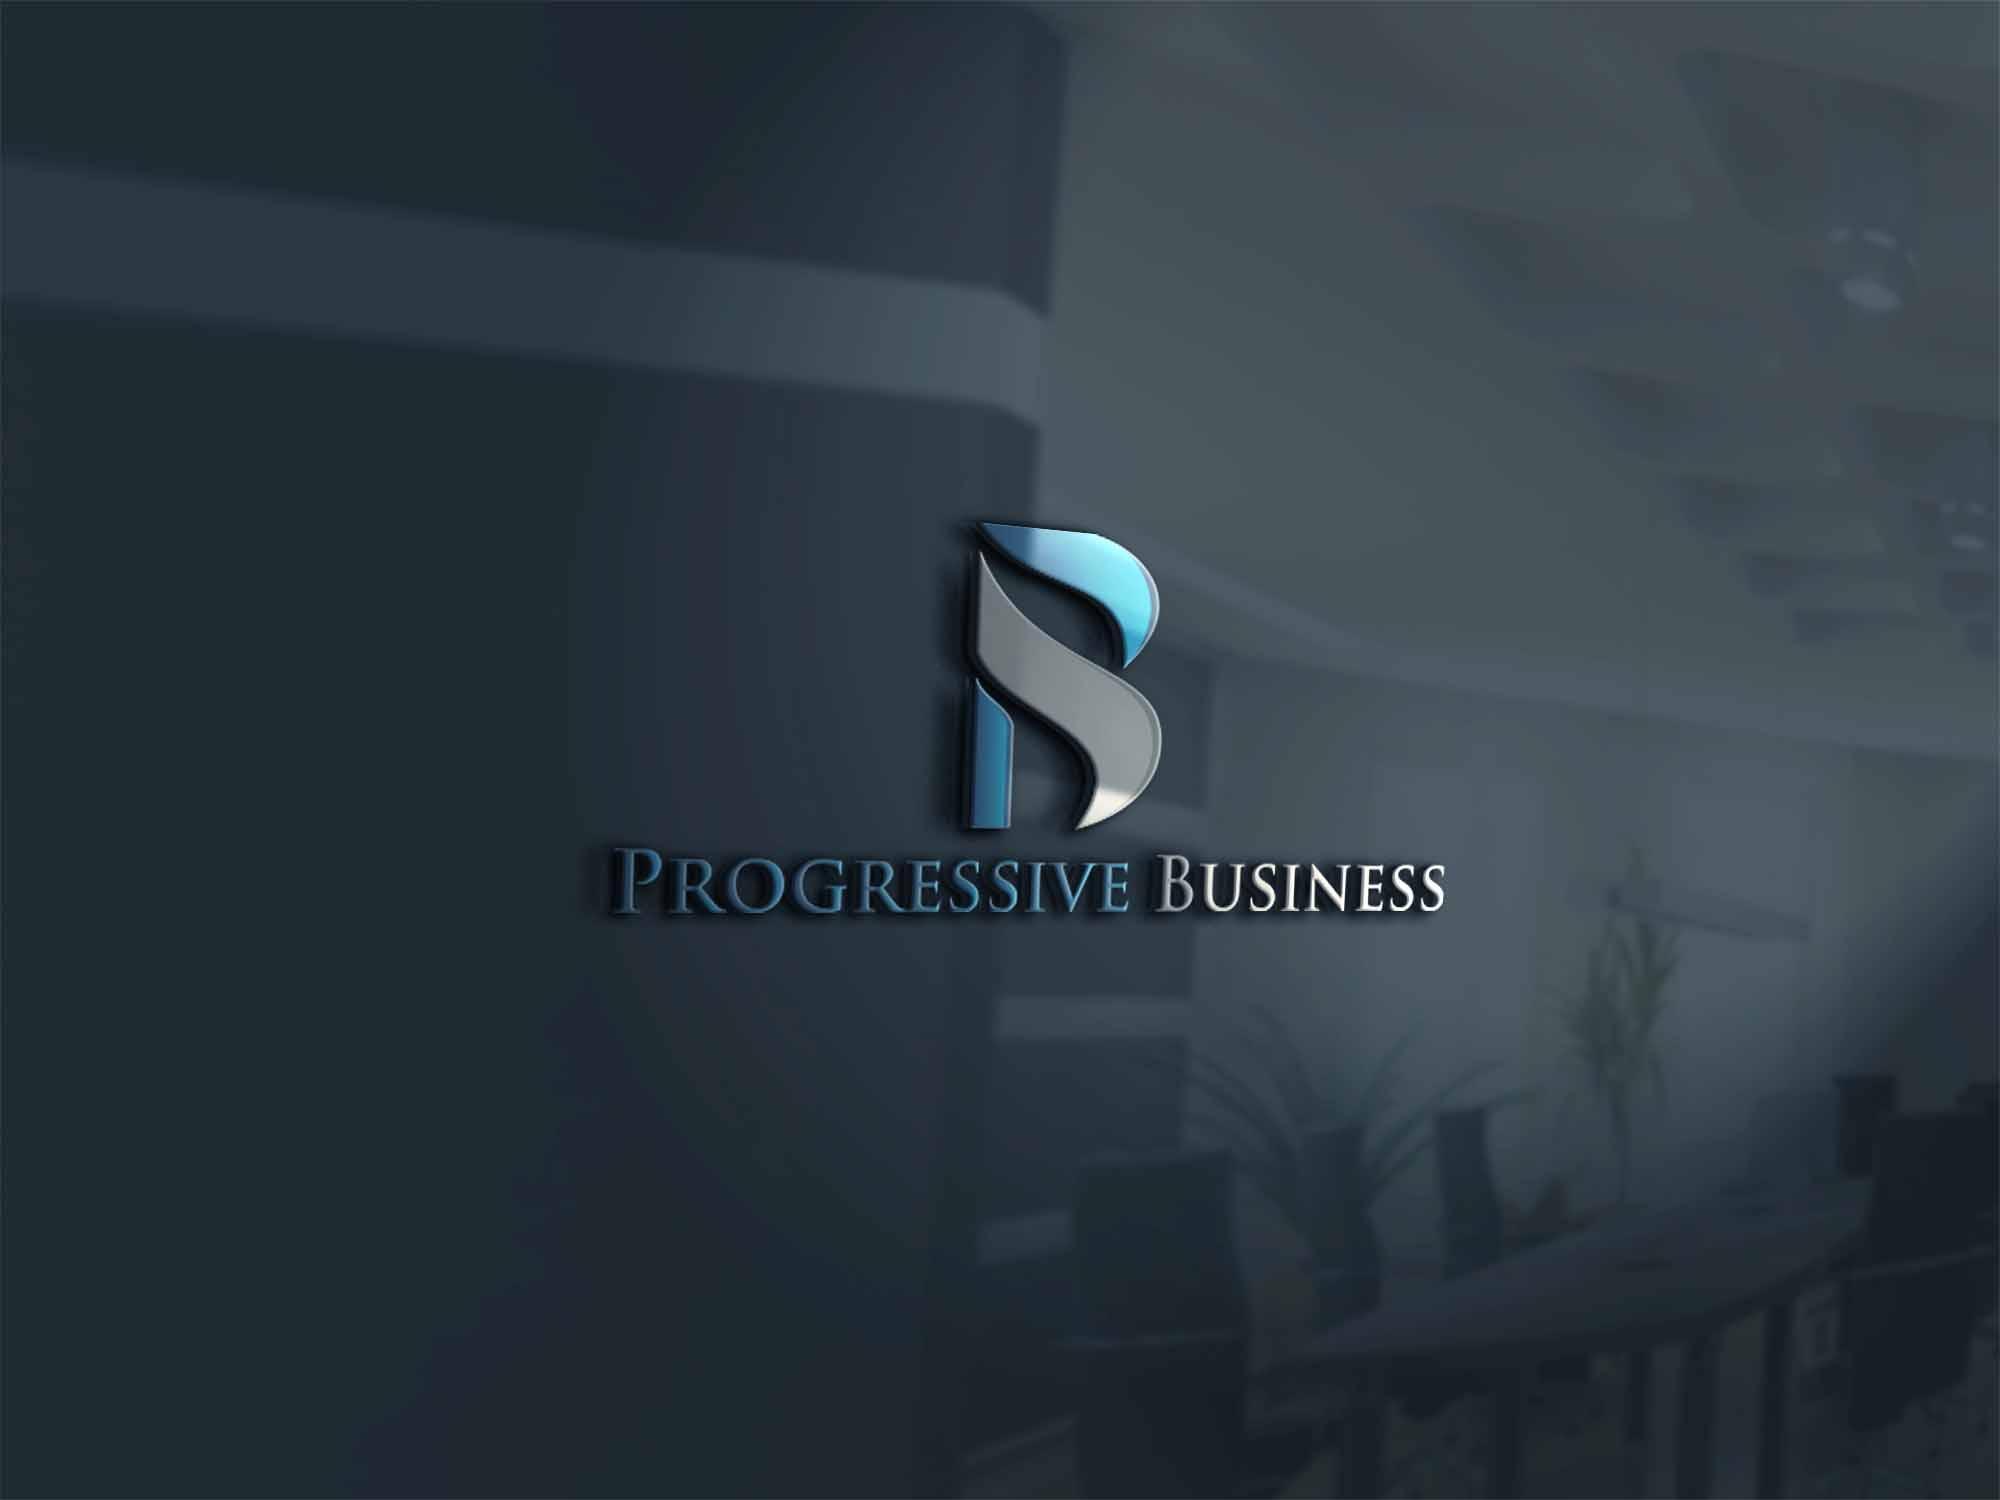 Logo Design by Private User - Entry No. 83 in the Logo Design Contest Captivating Logo Design for Progressive Business.